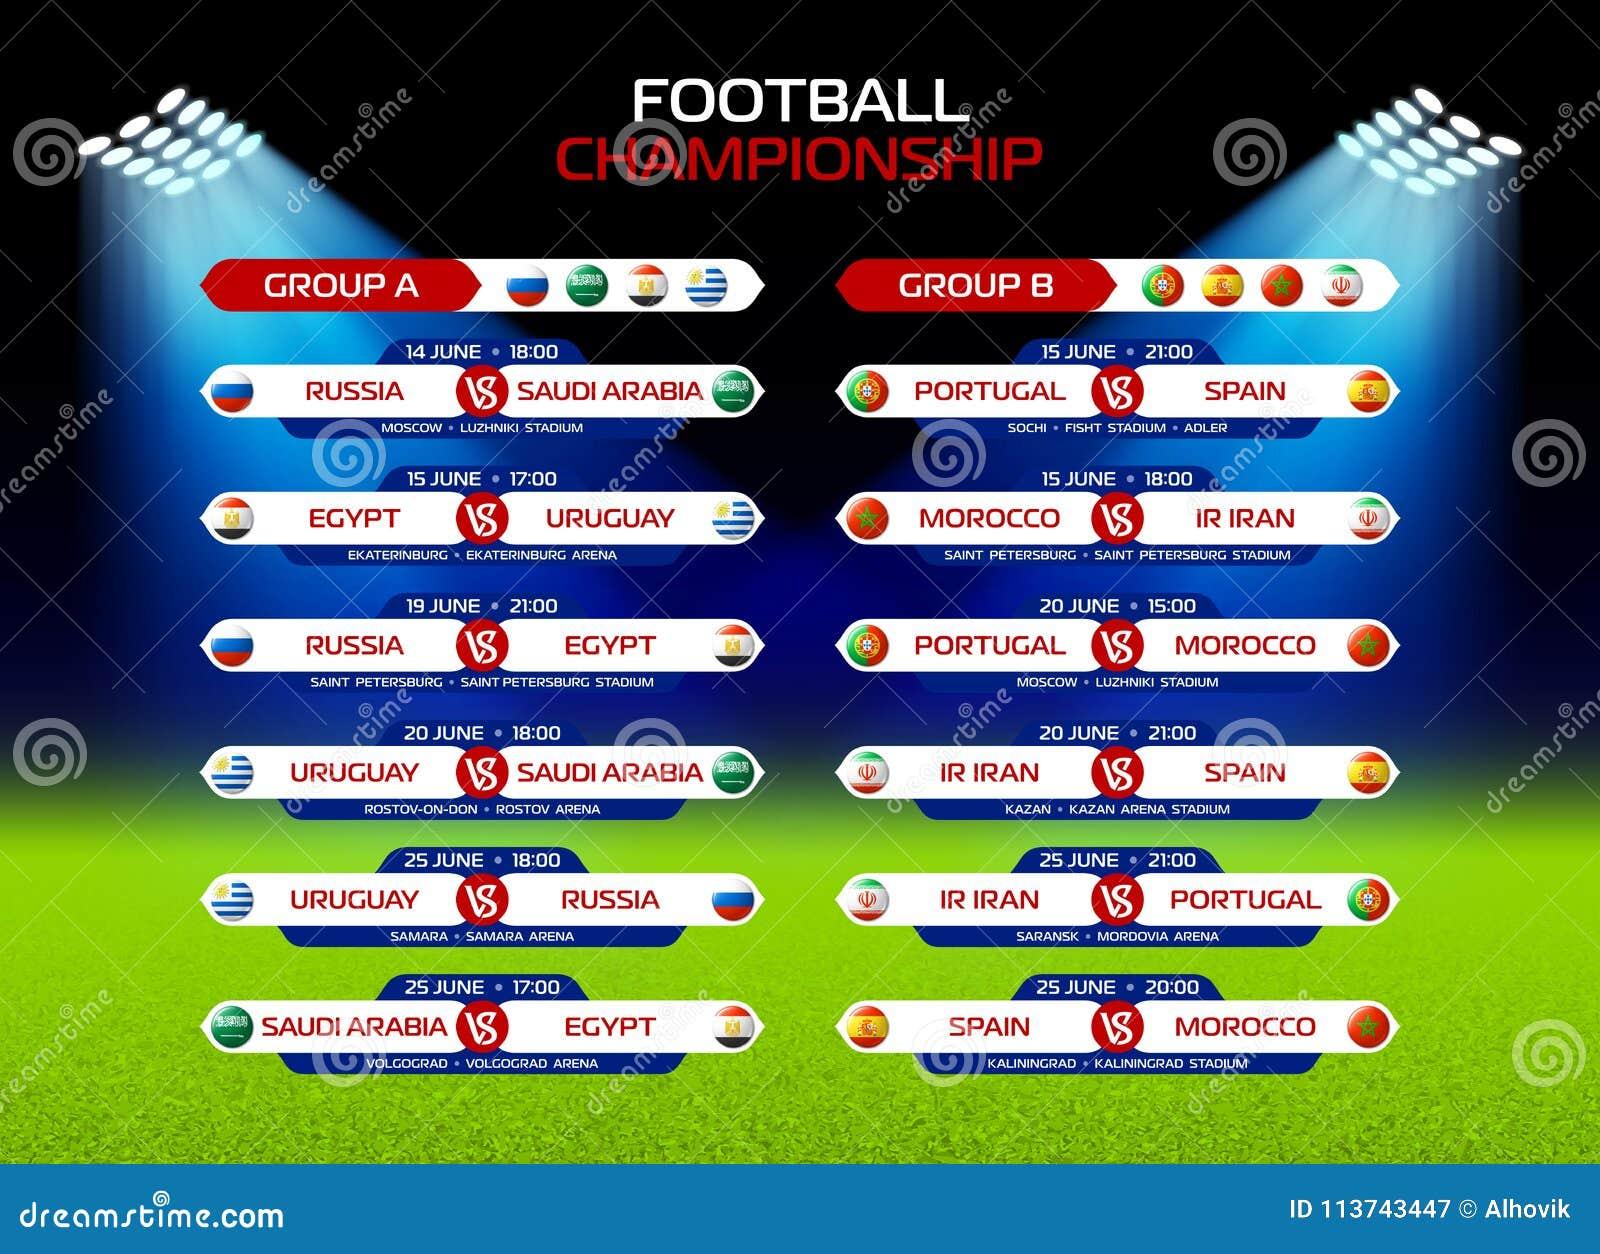 Programme De Match De Championnat Du Football En Russie 2018